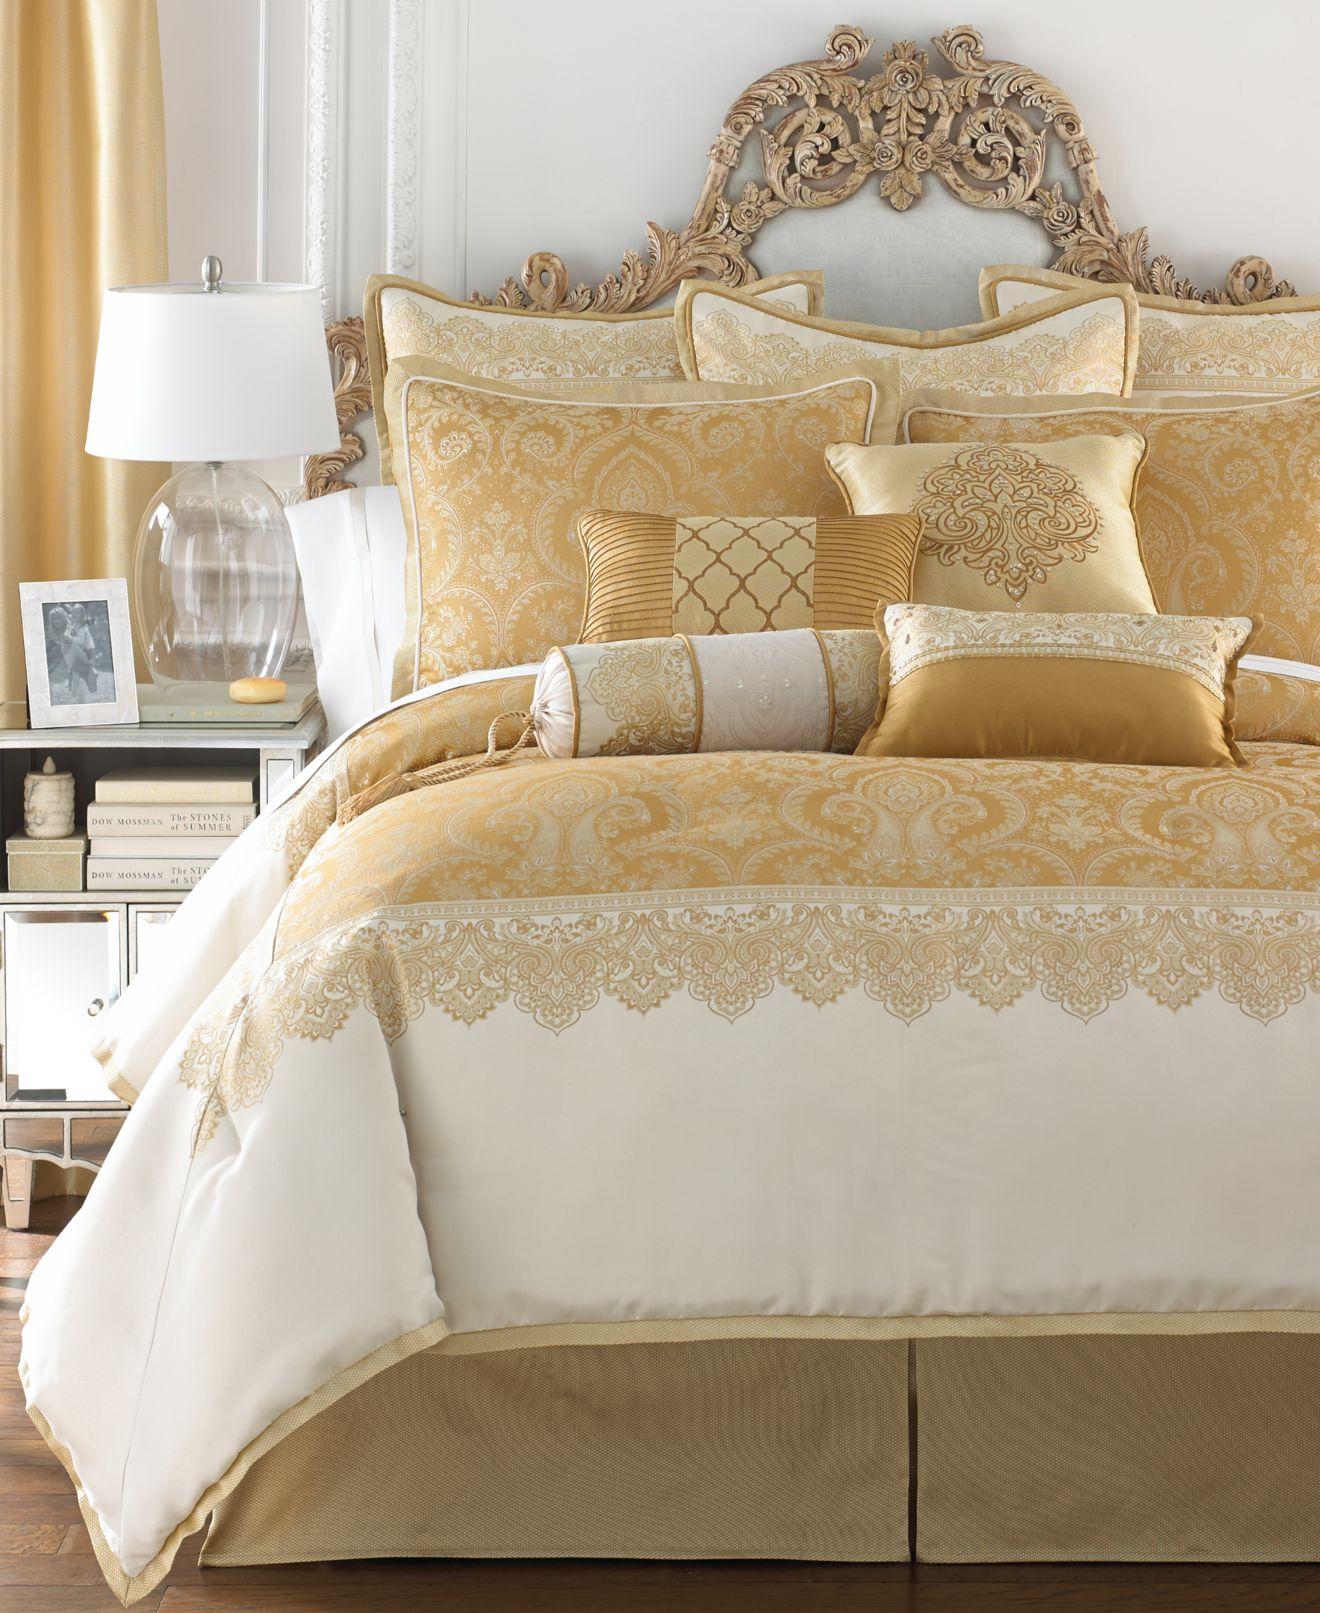 bedding sets bedding on sale - macy's